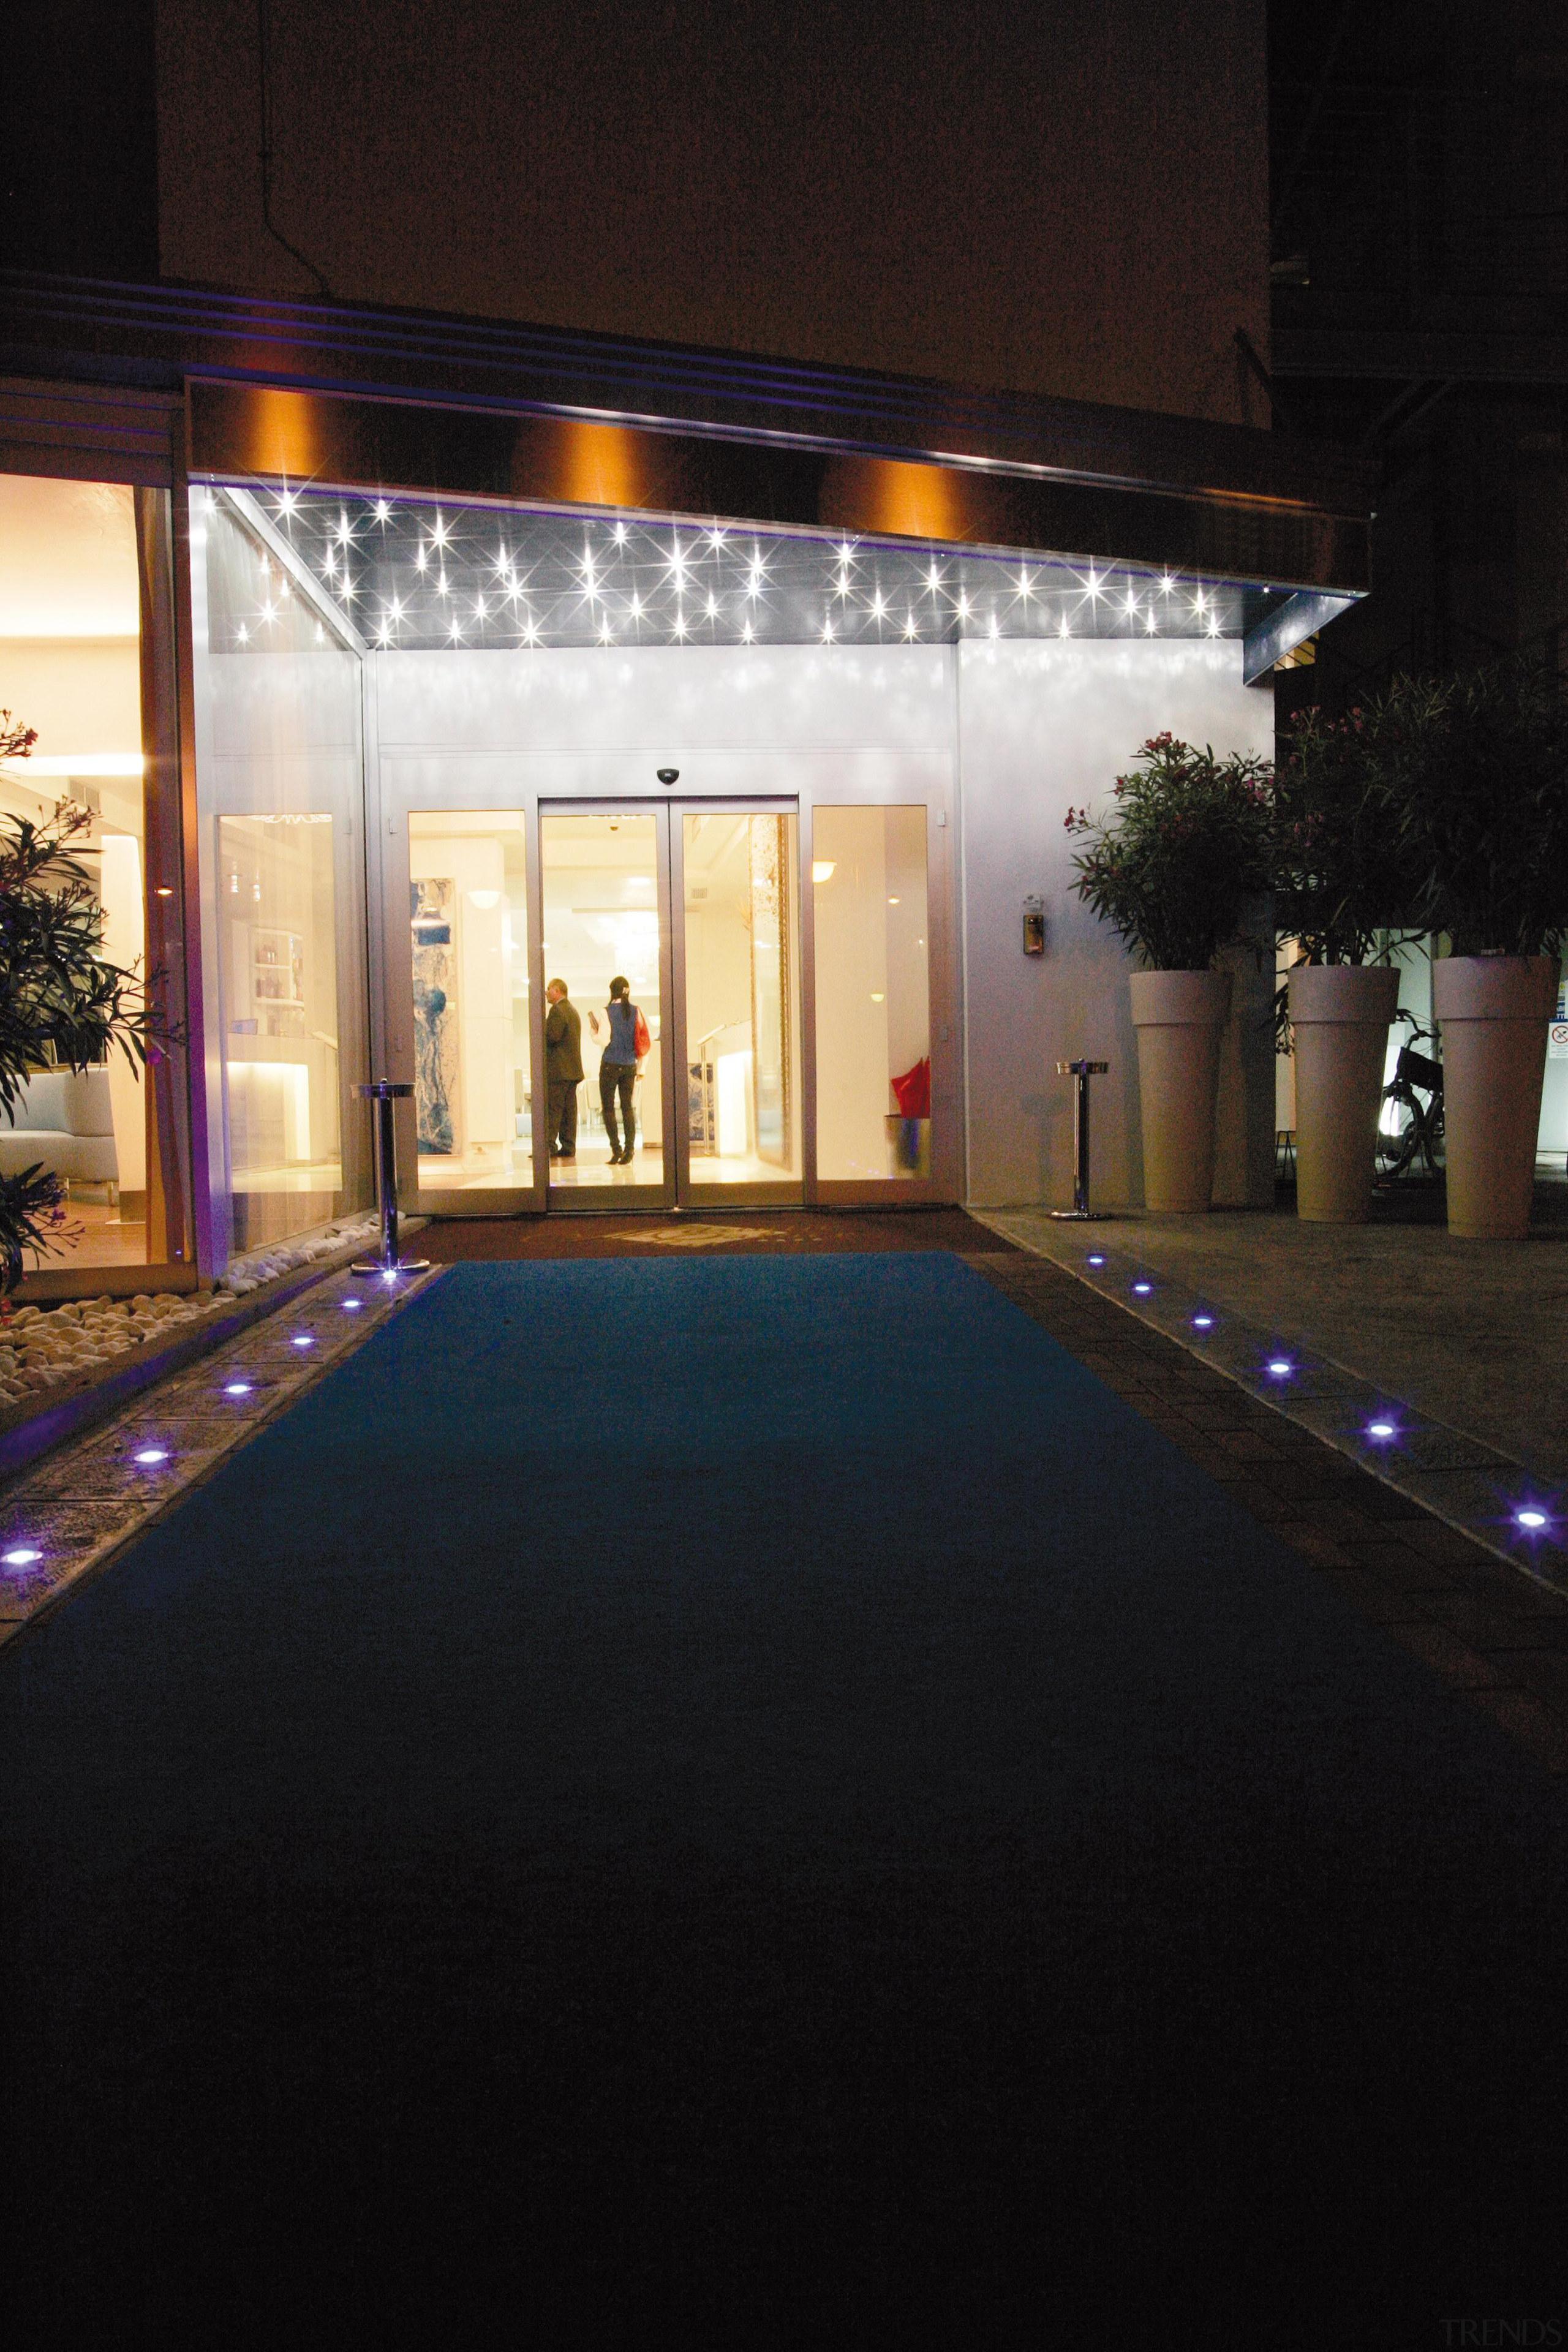 LED Lights - architecture | ceiling | light architecture, ceiling, light, lighting, night, property, black